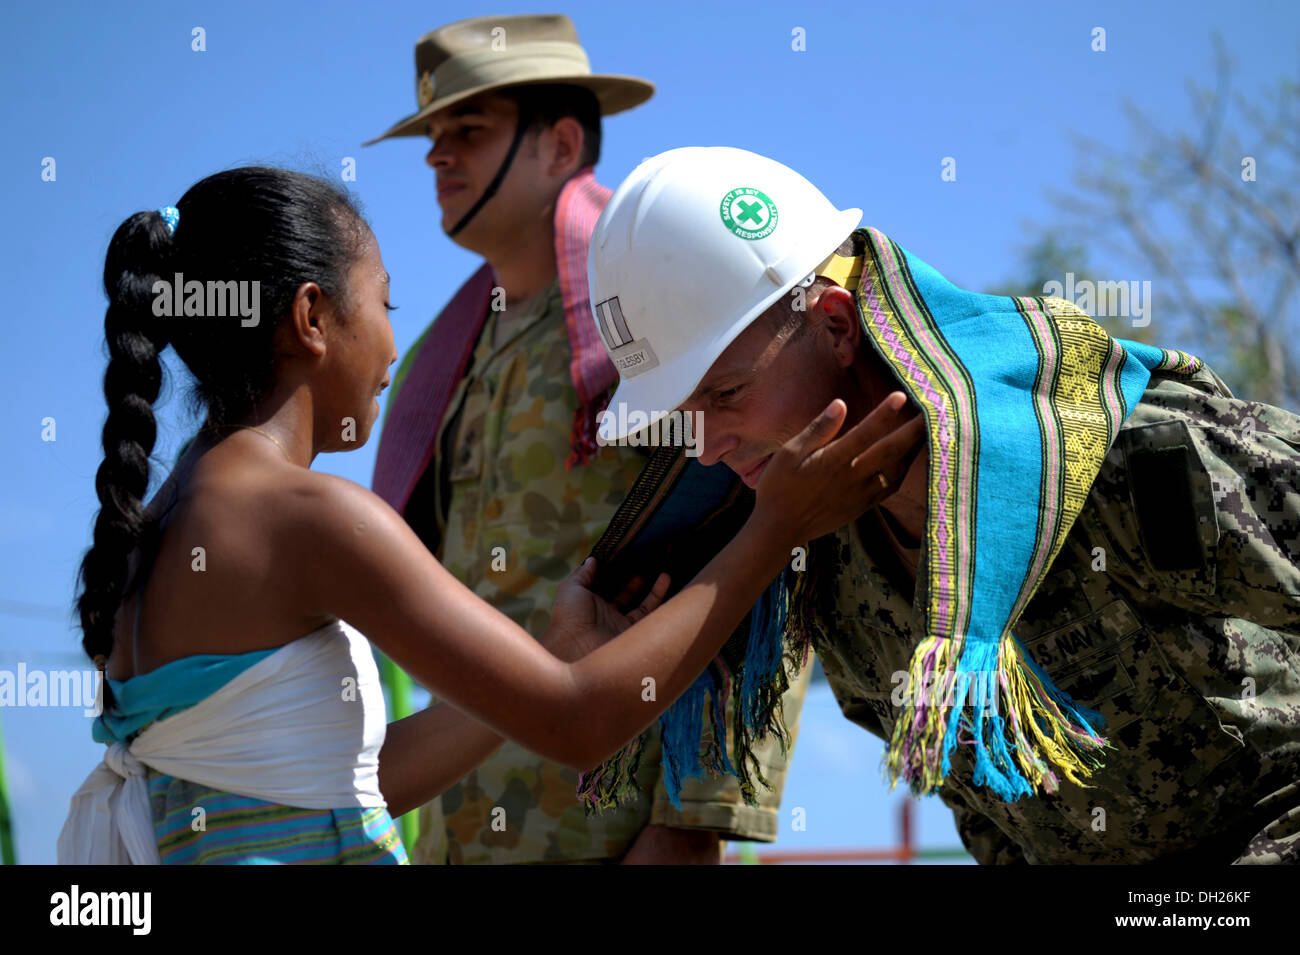 METRINARO, Timor-Leste – (Oct. 28, 2013) U.S. Navy Seabee Navy Lt. Brent Oglesby, the officer-in-charge of Naval Stock Photo